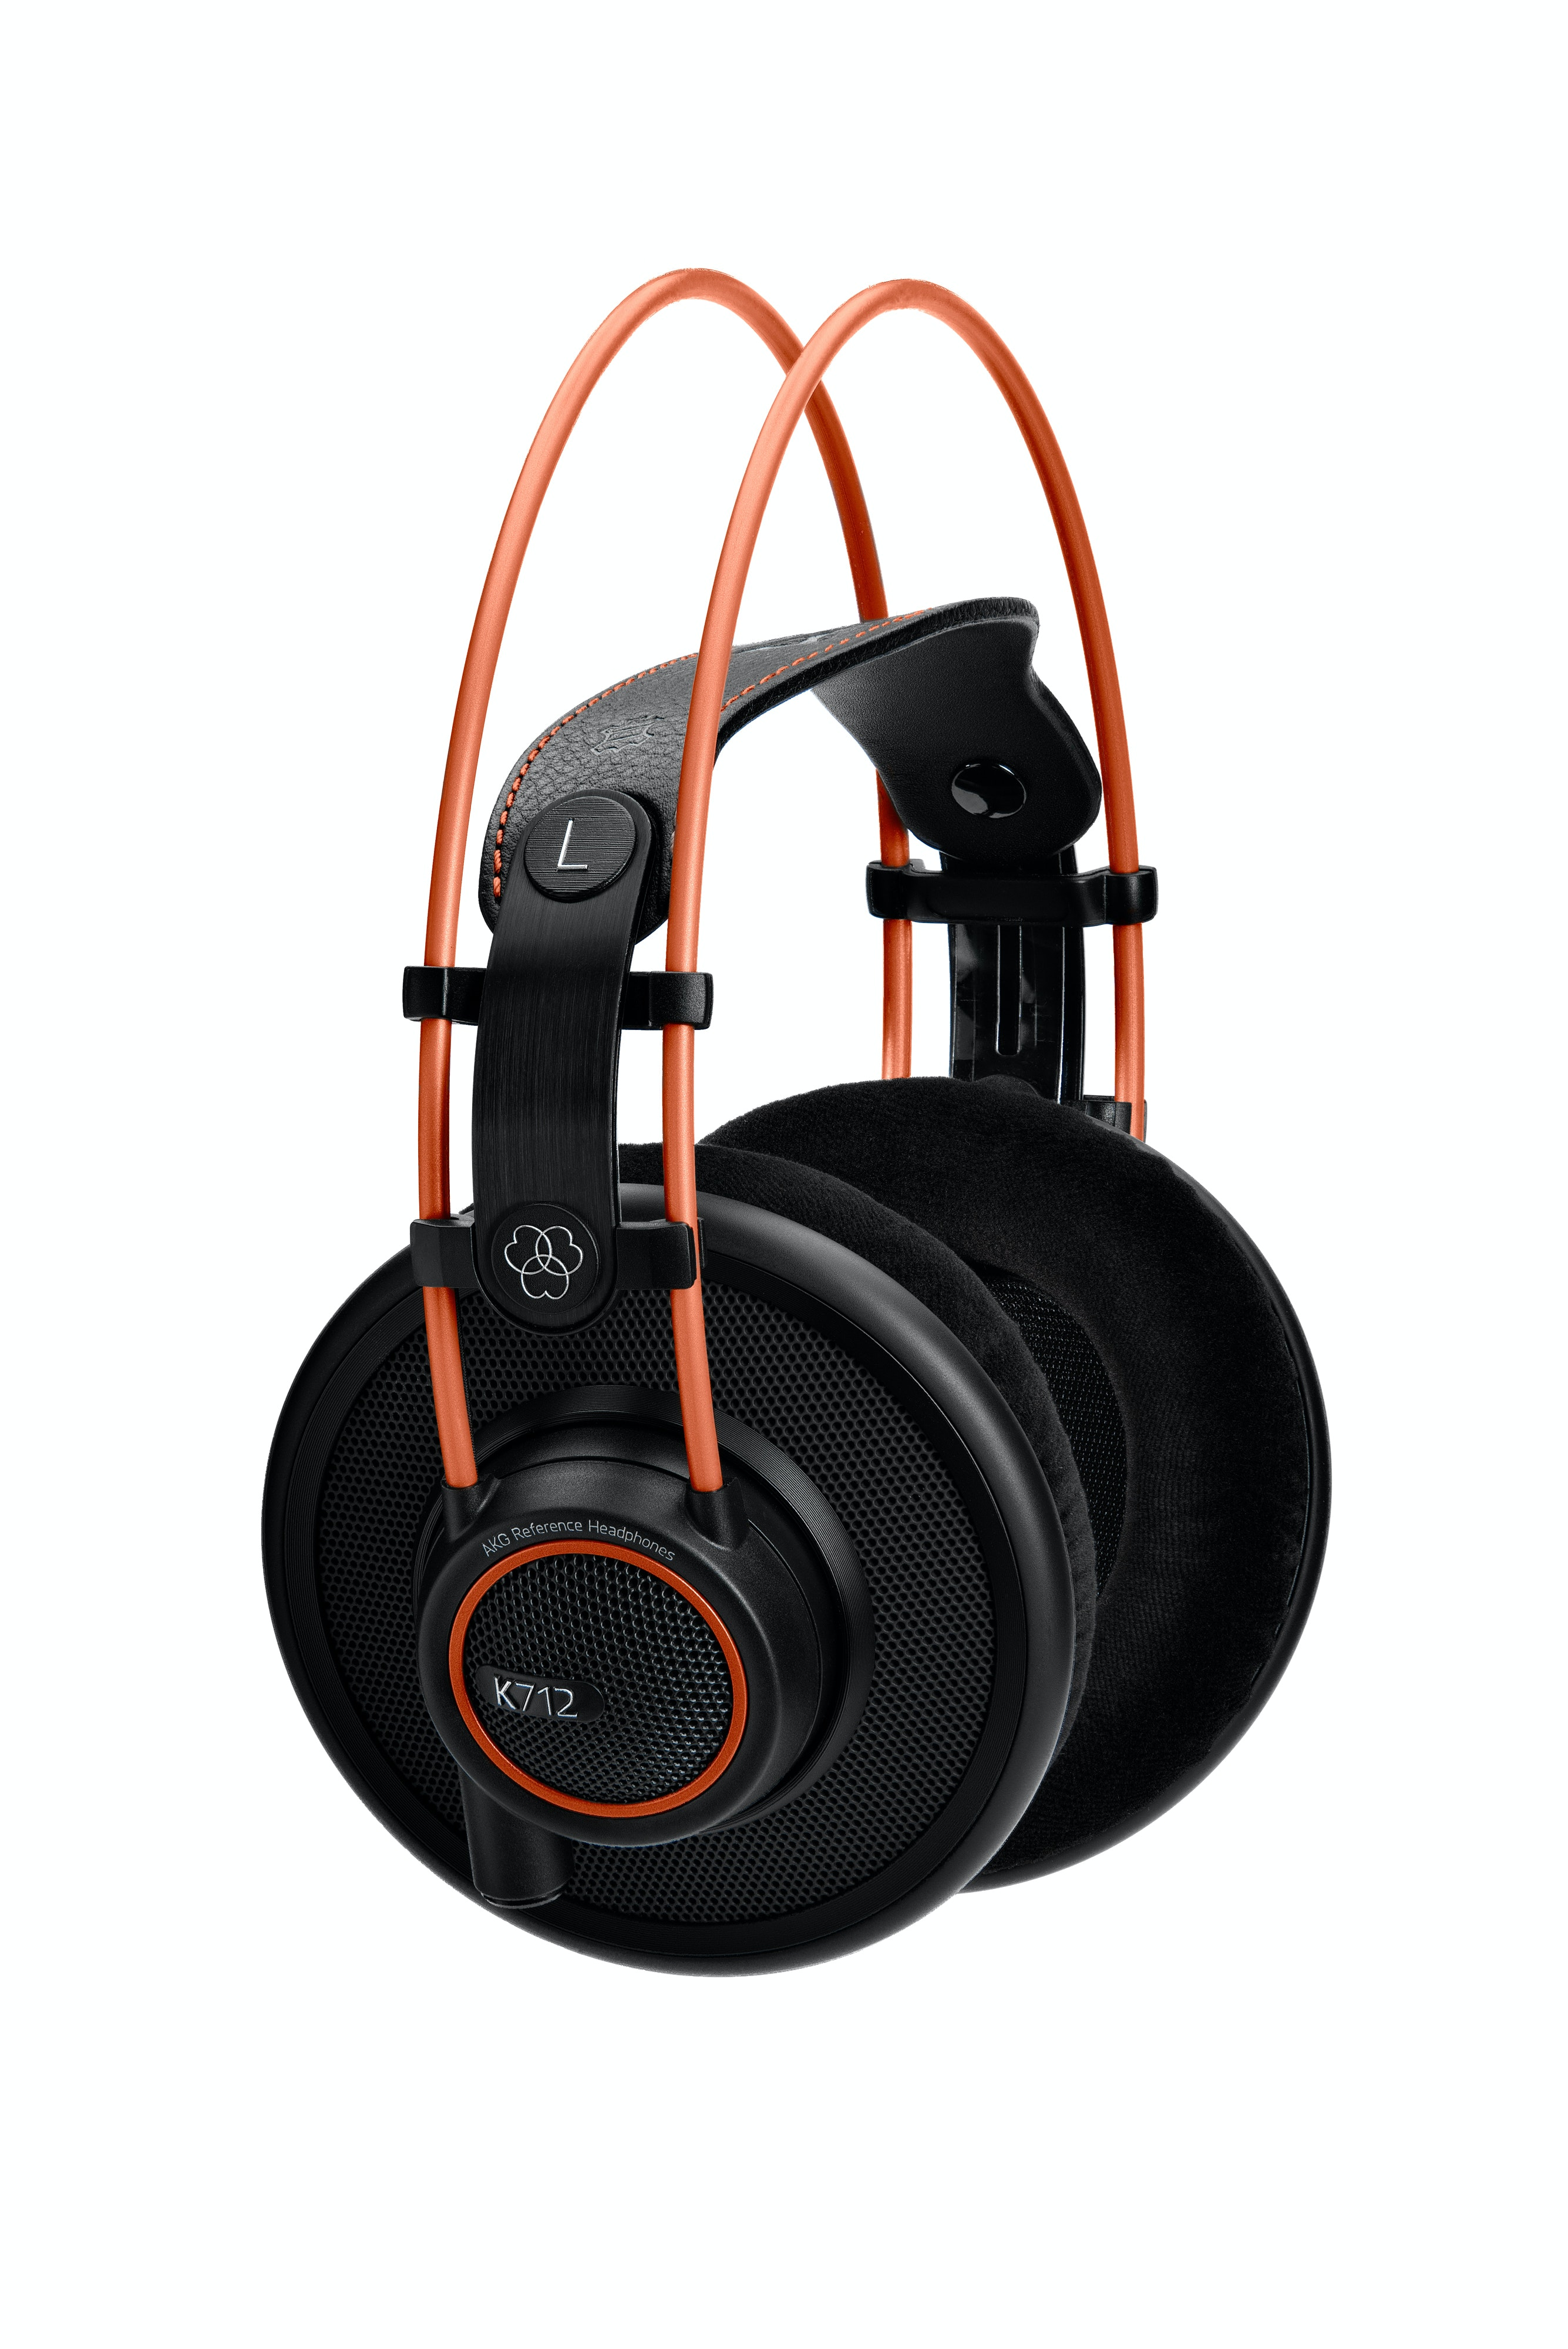 K712 PRO - Reference Studio Headphones | AKG Acoustics